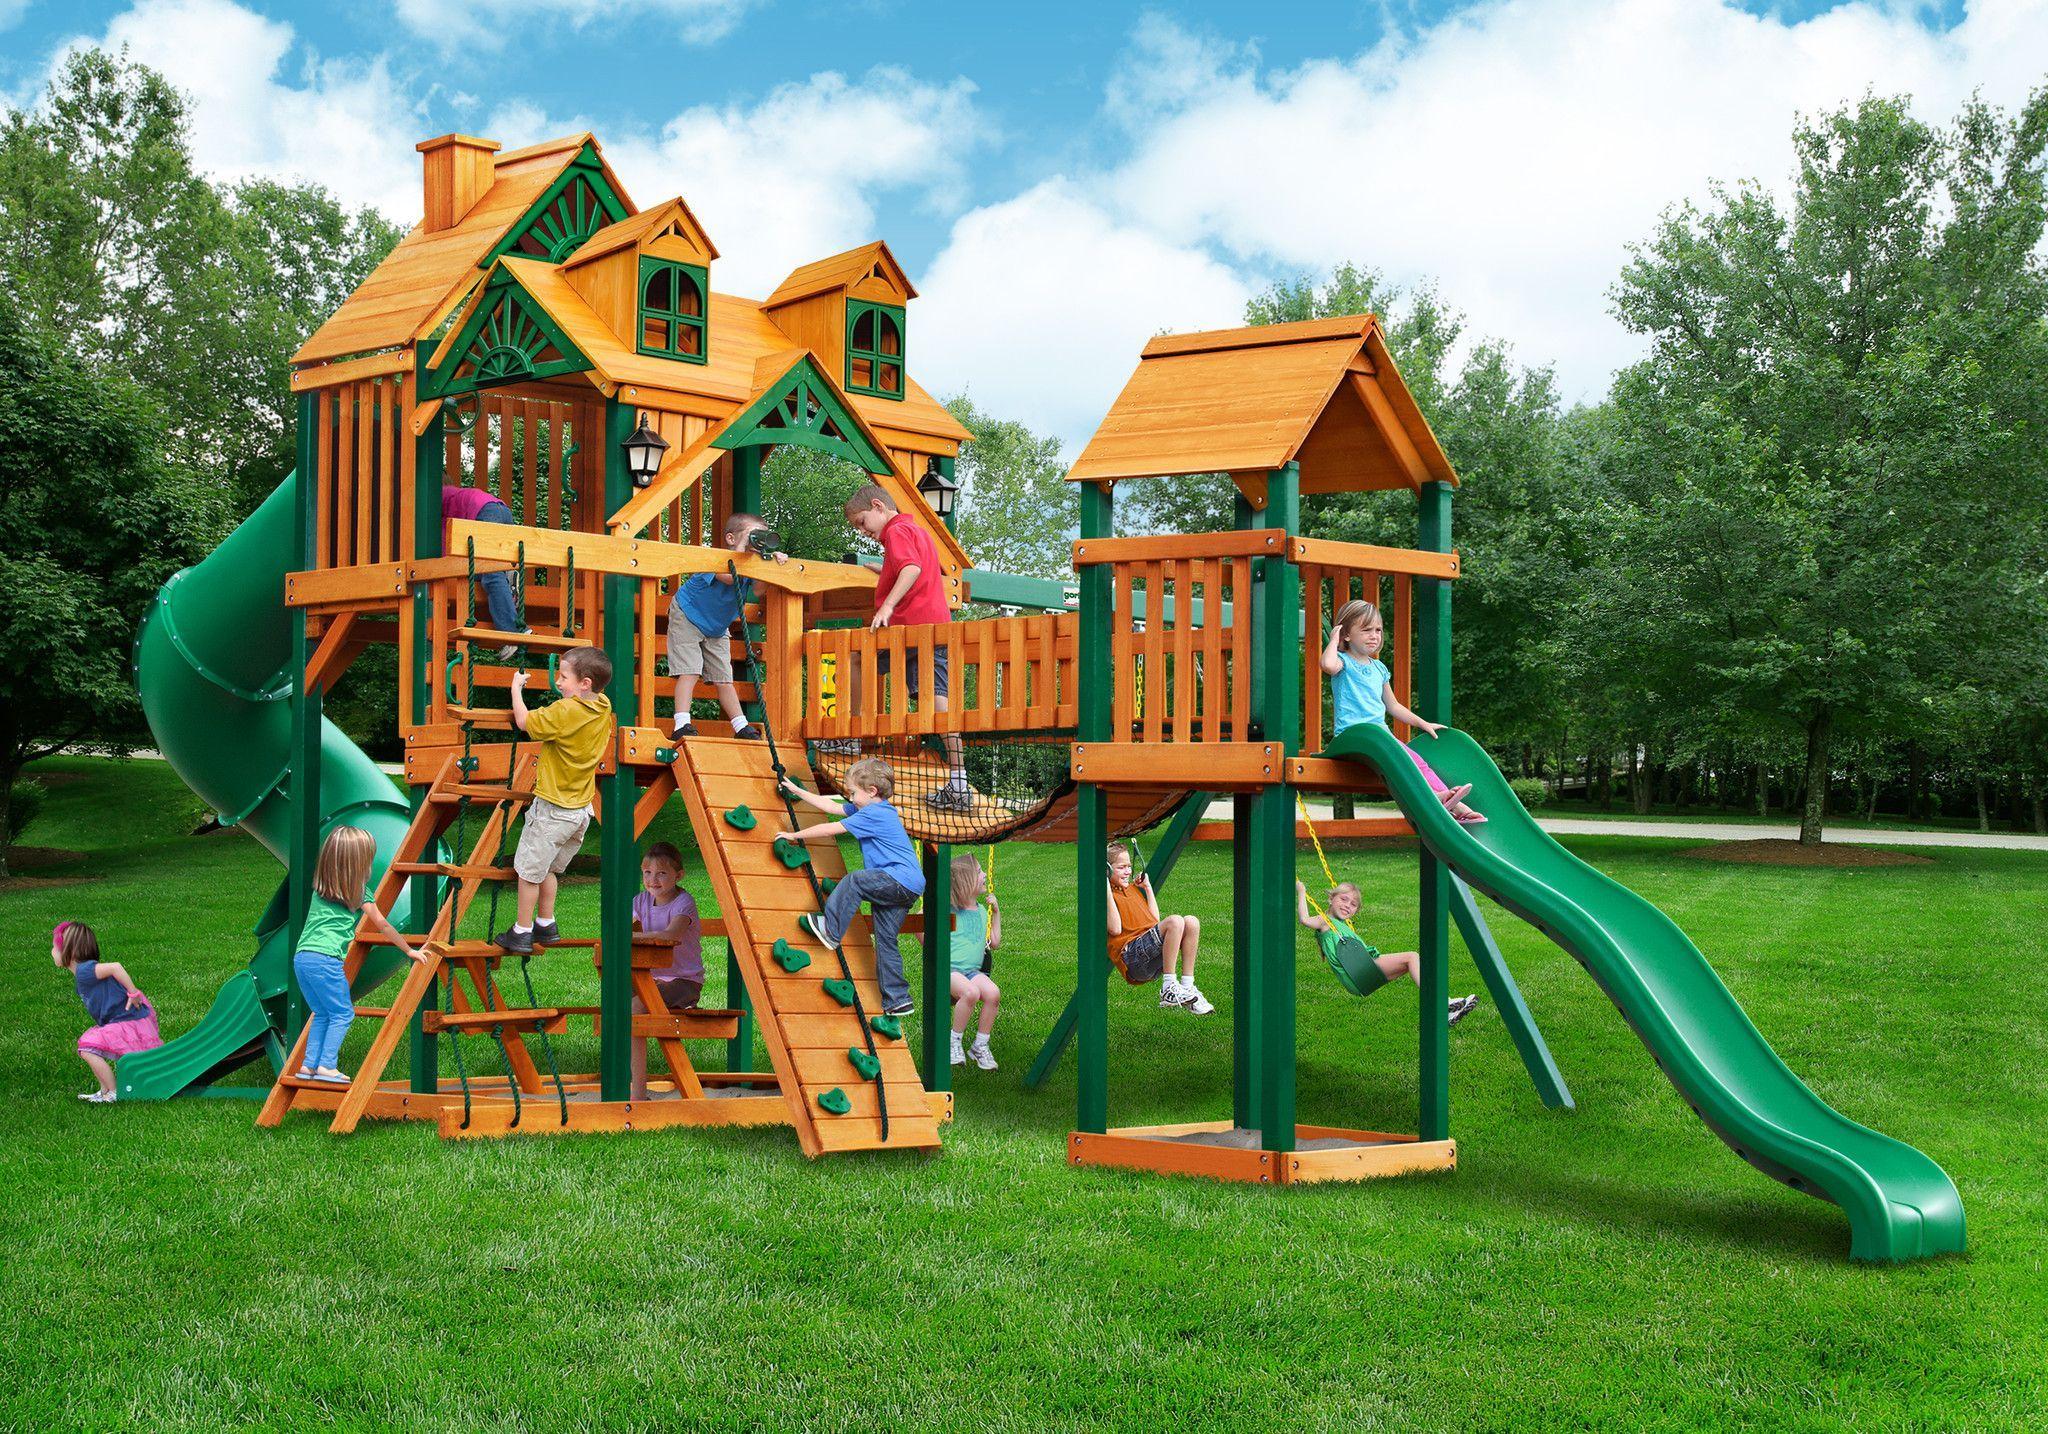 Gorilla Playsets Treasure Trove 1 w/Malibu Wood Roof Swing Set